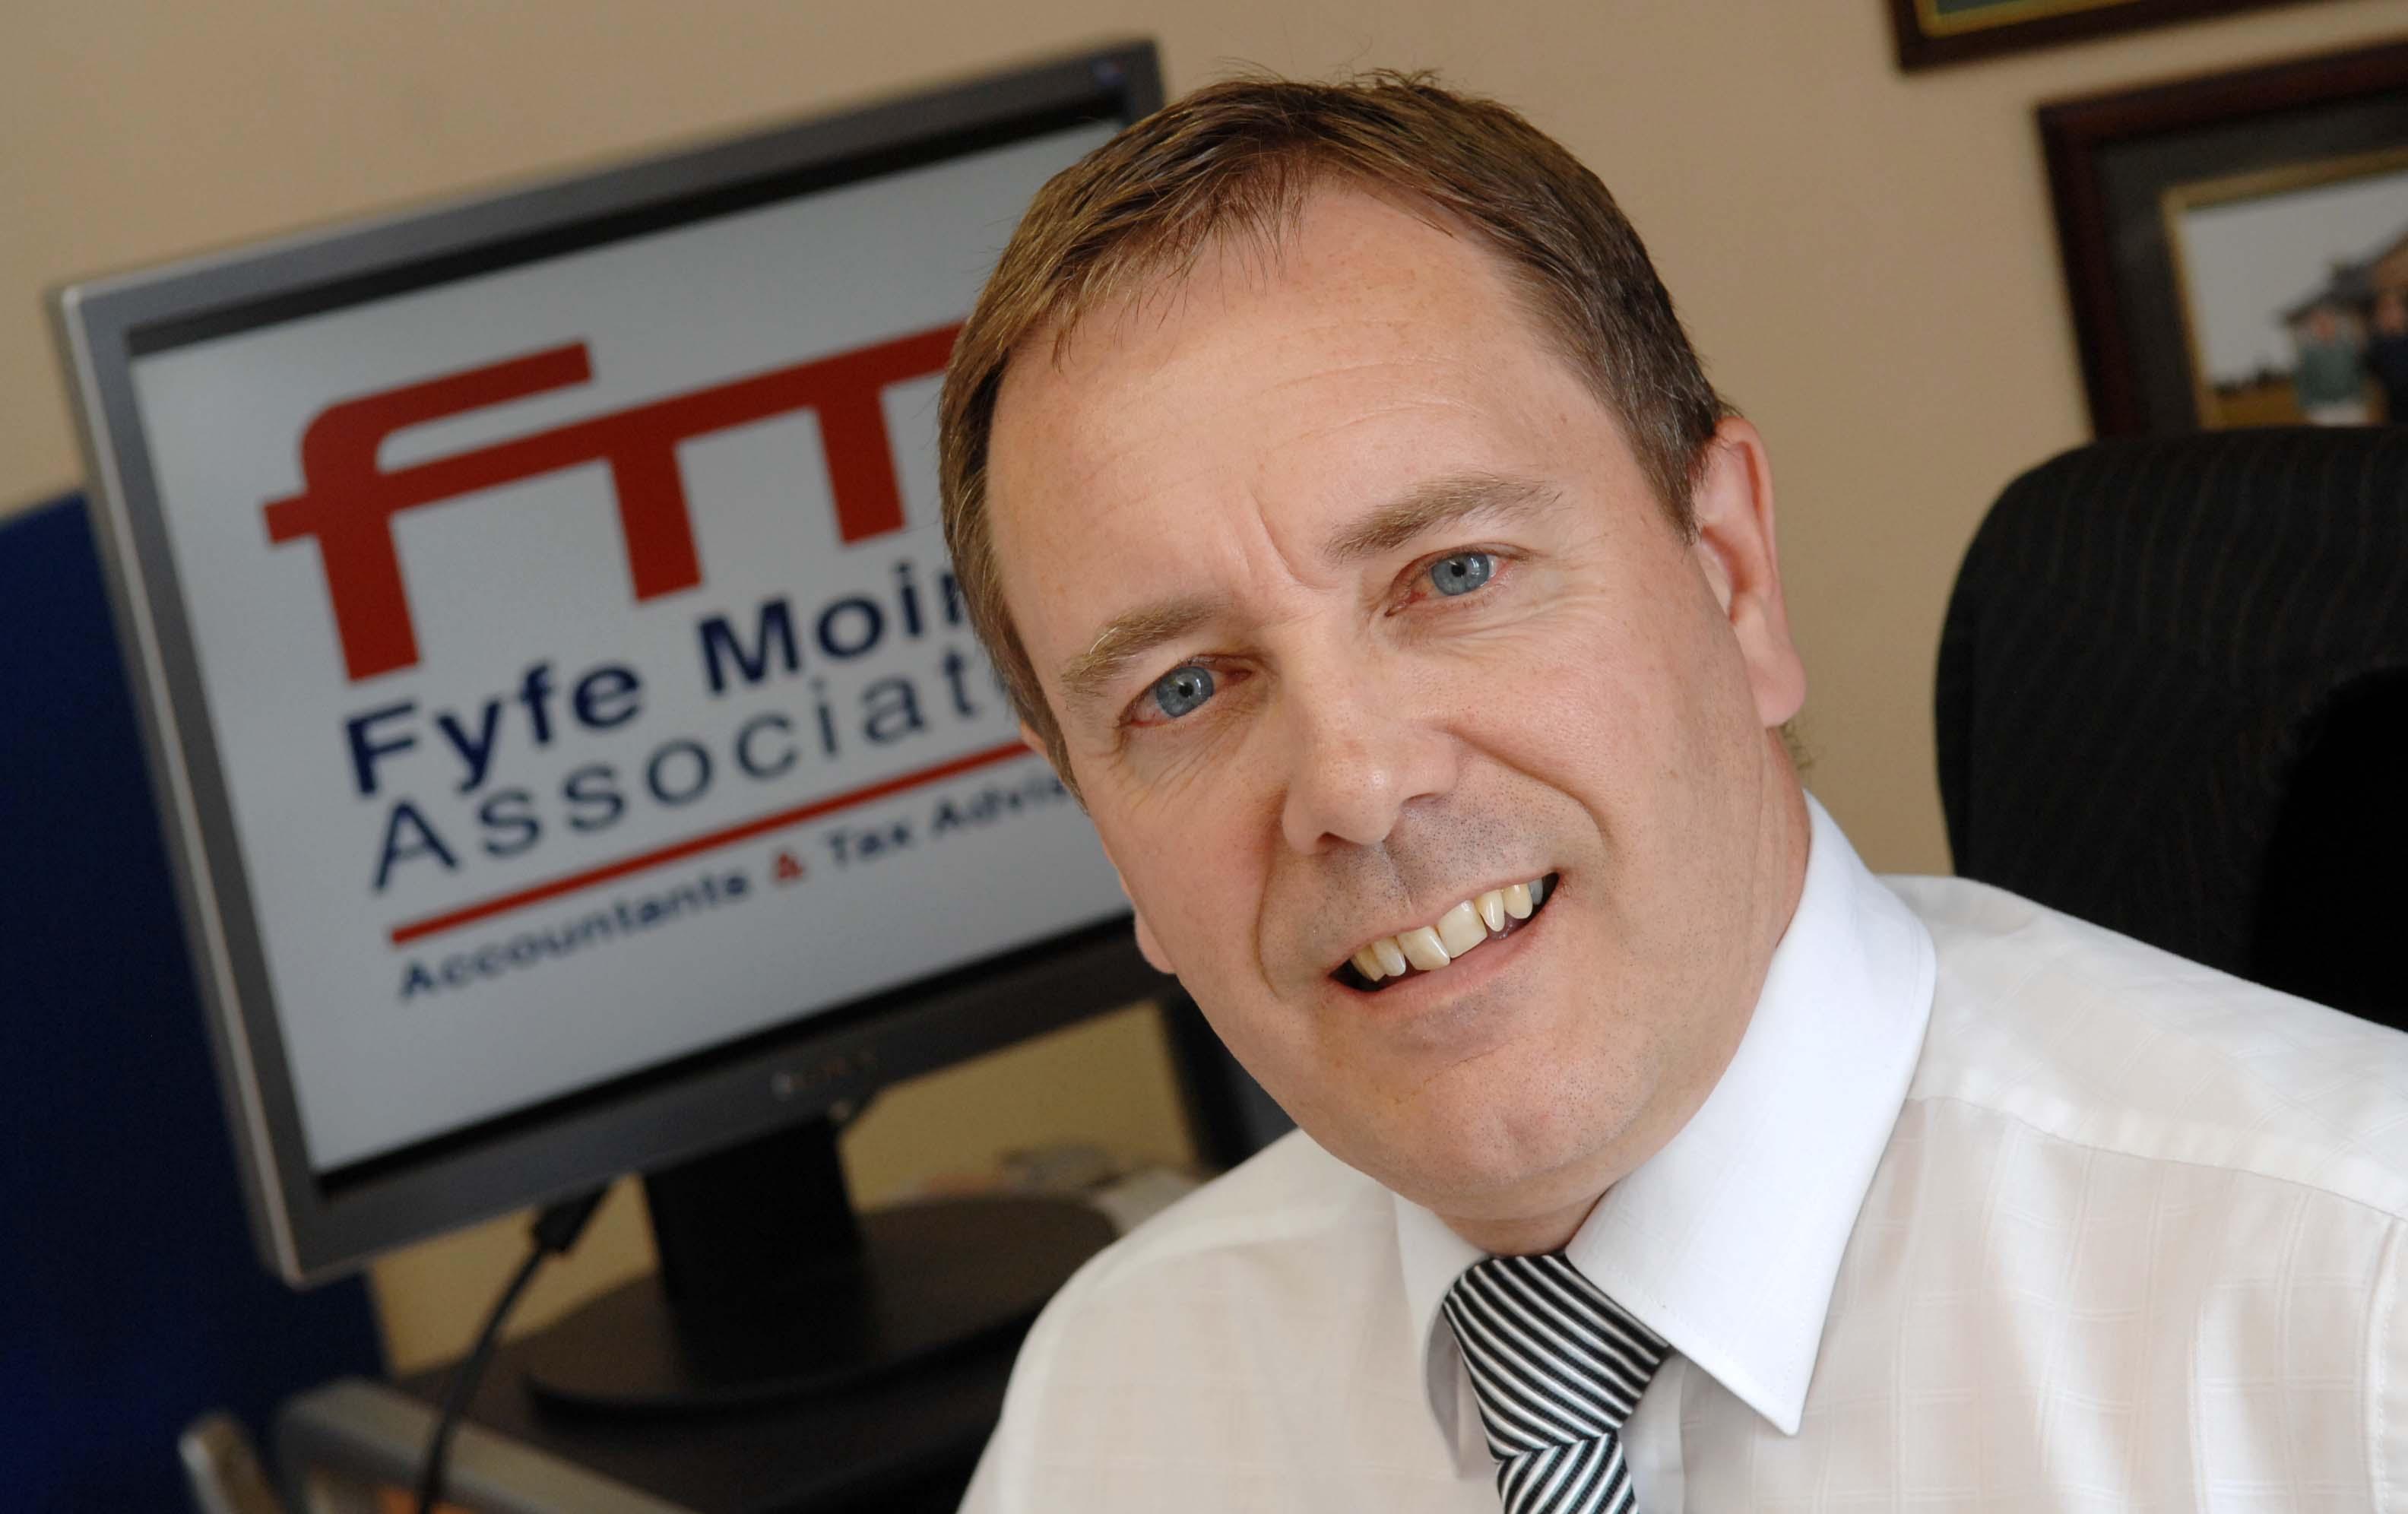 Fyfe Moir and Associates Director Alan Moir.